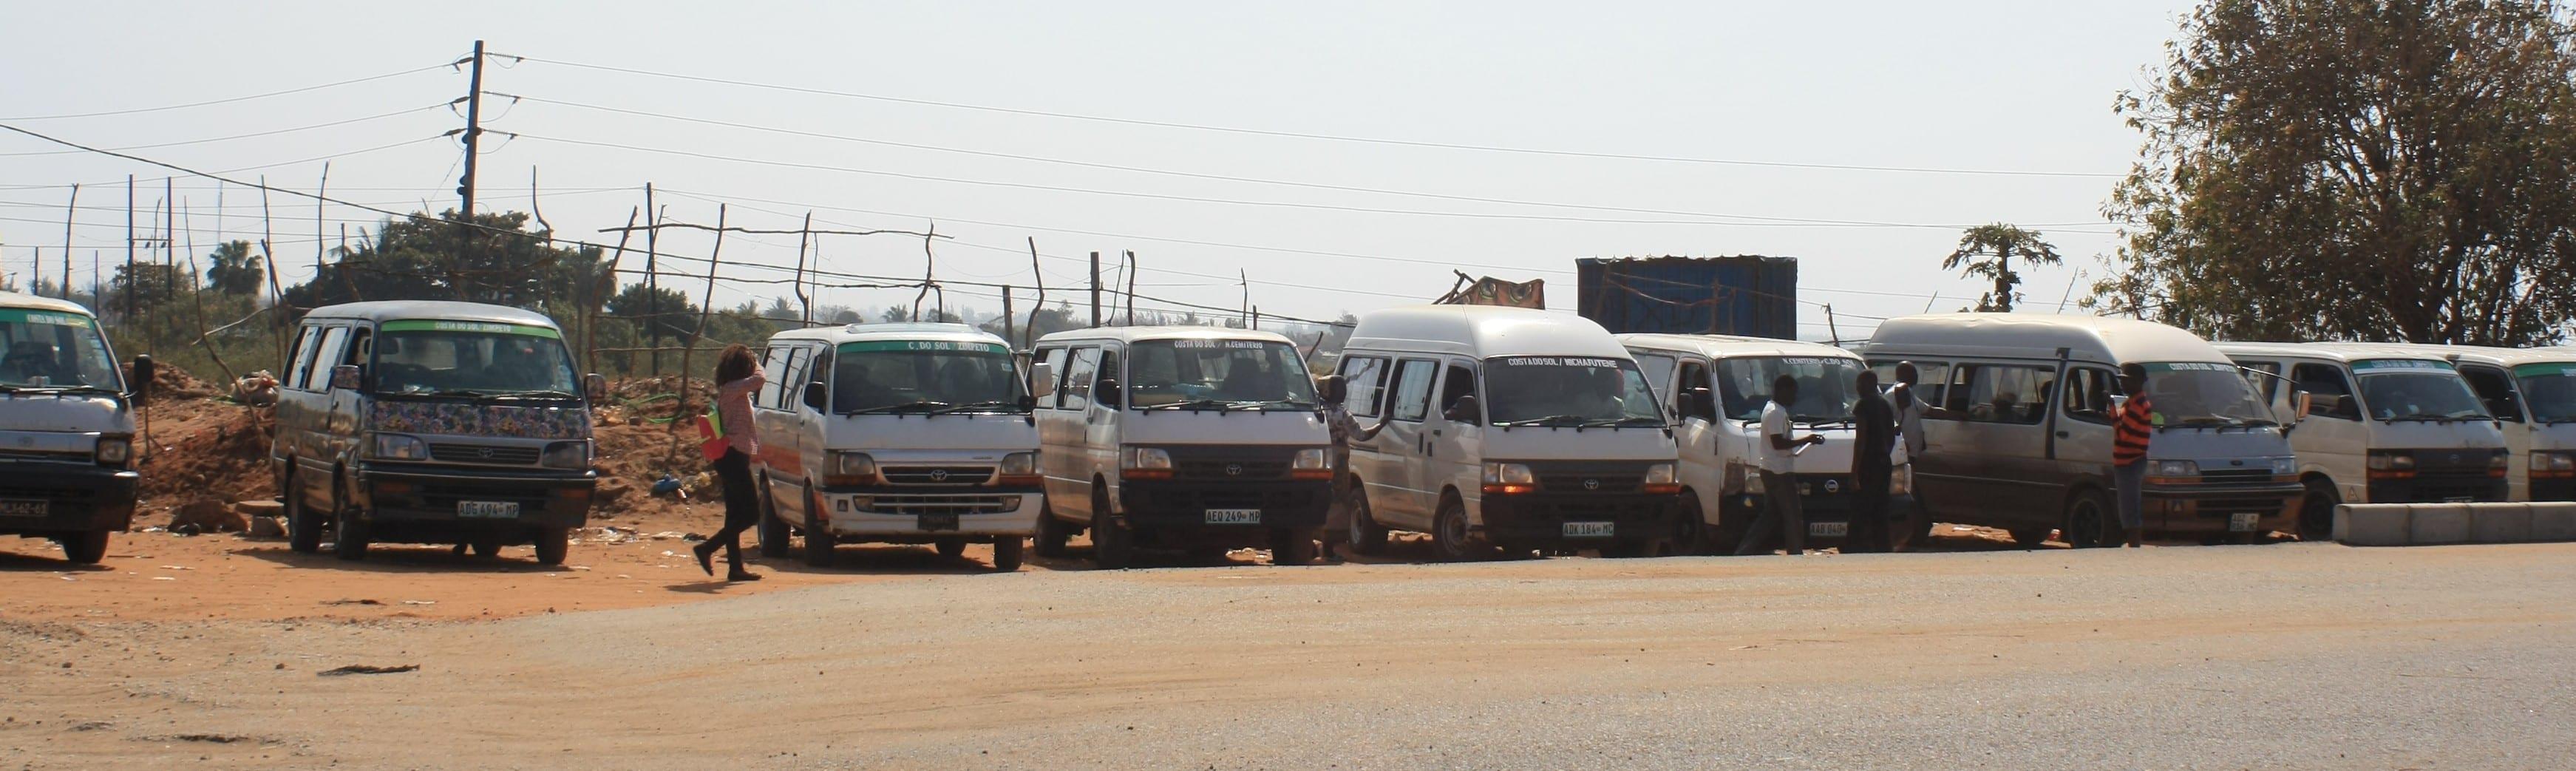 Chapas in Maputo